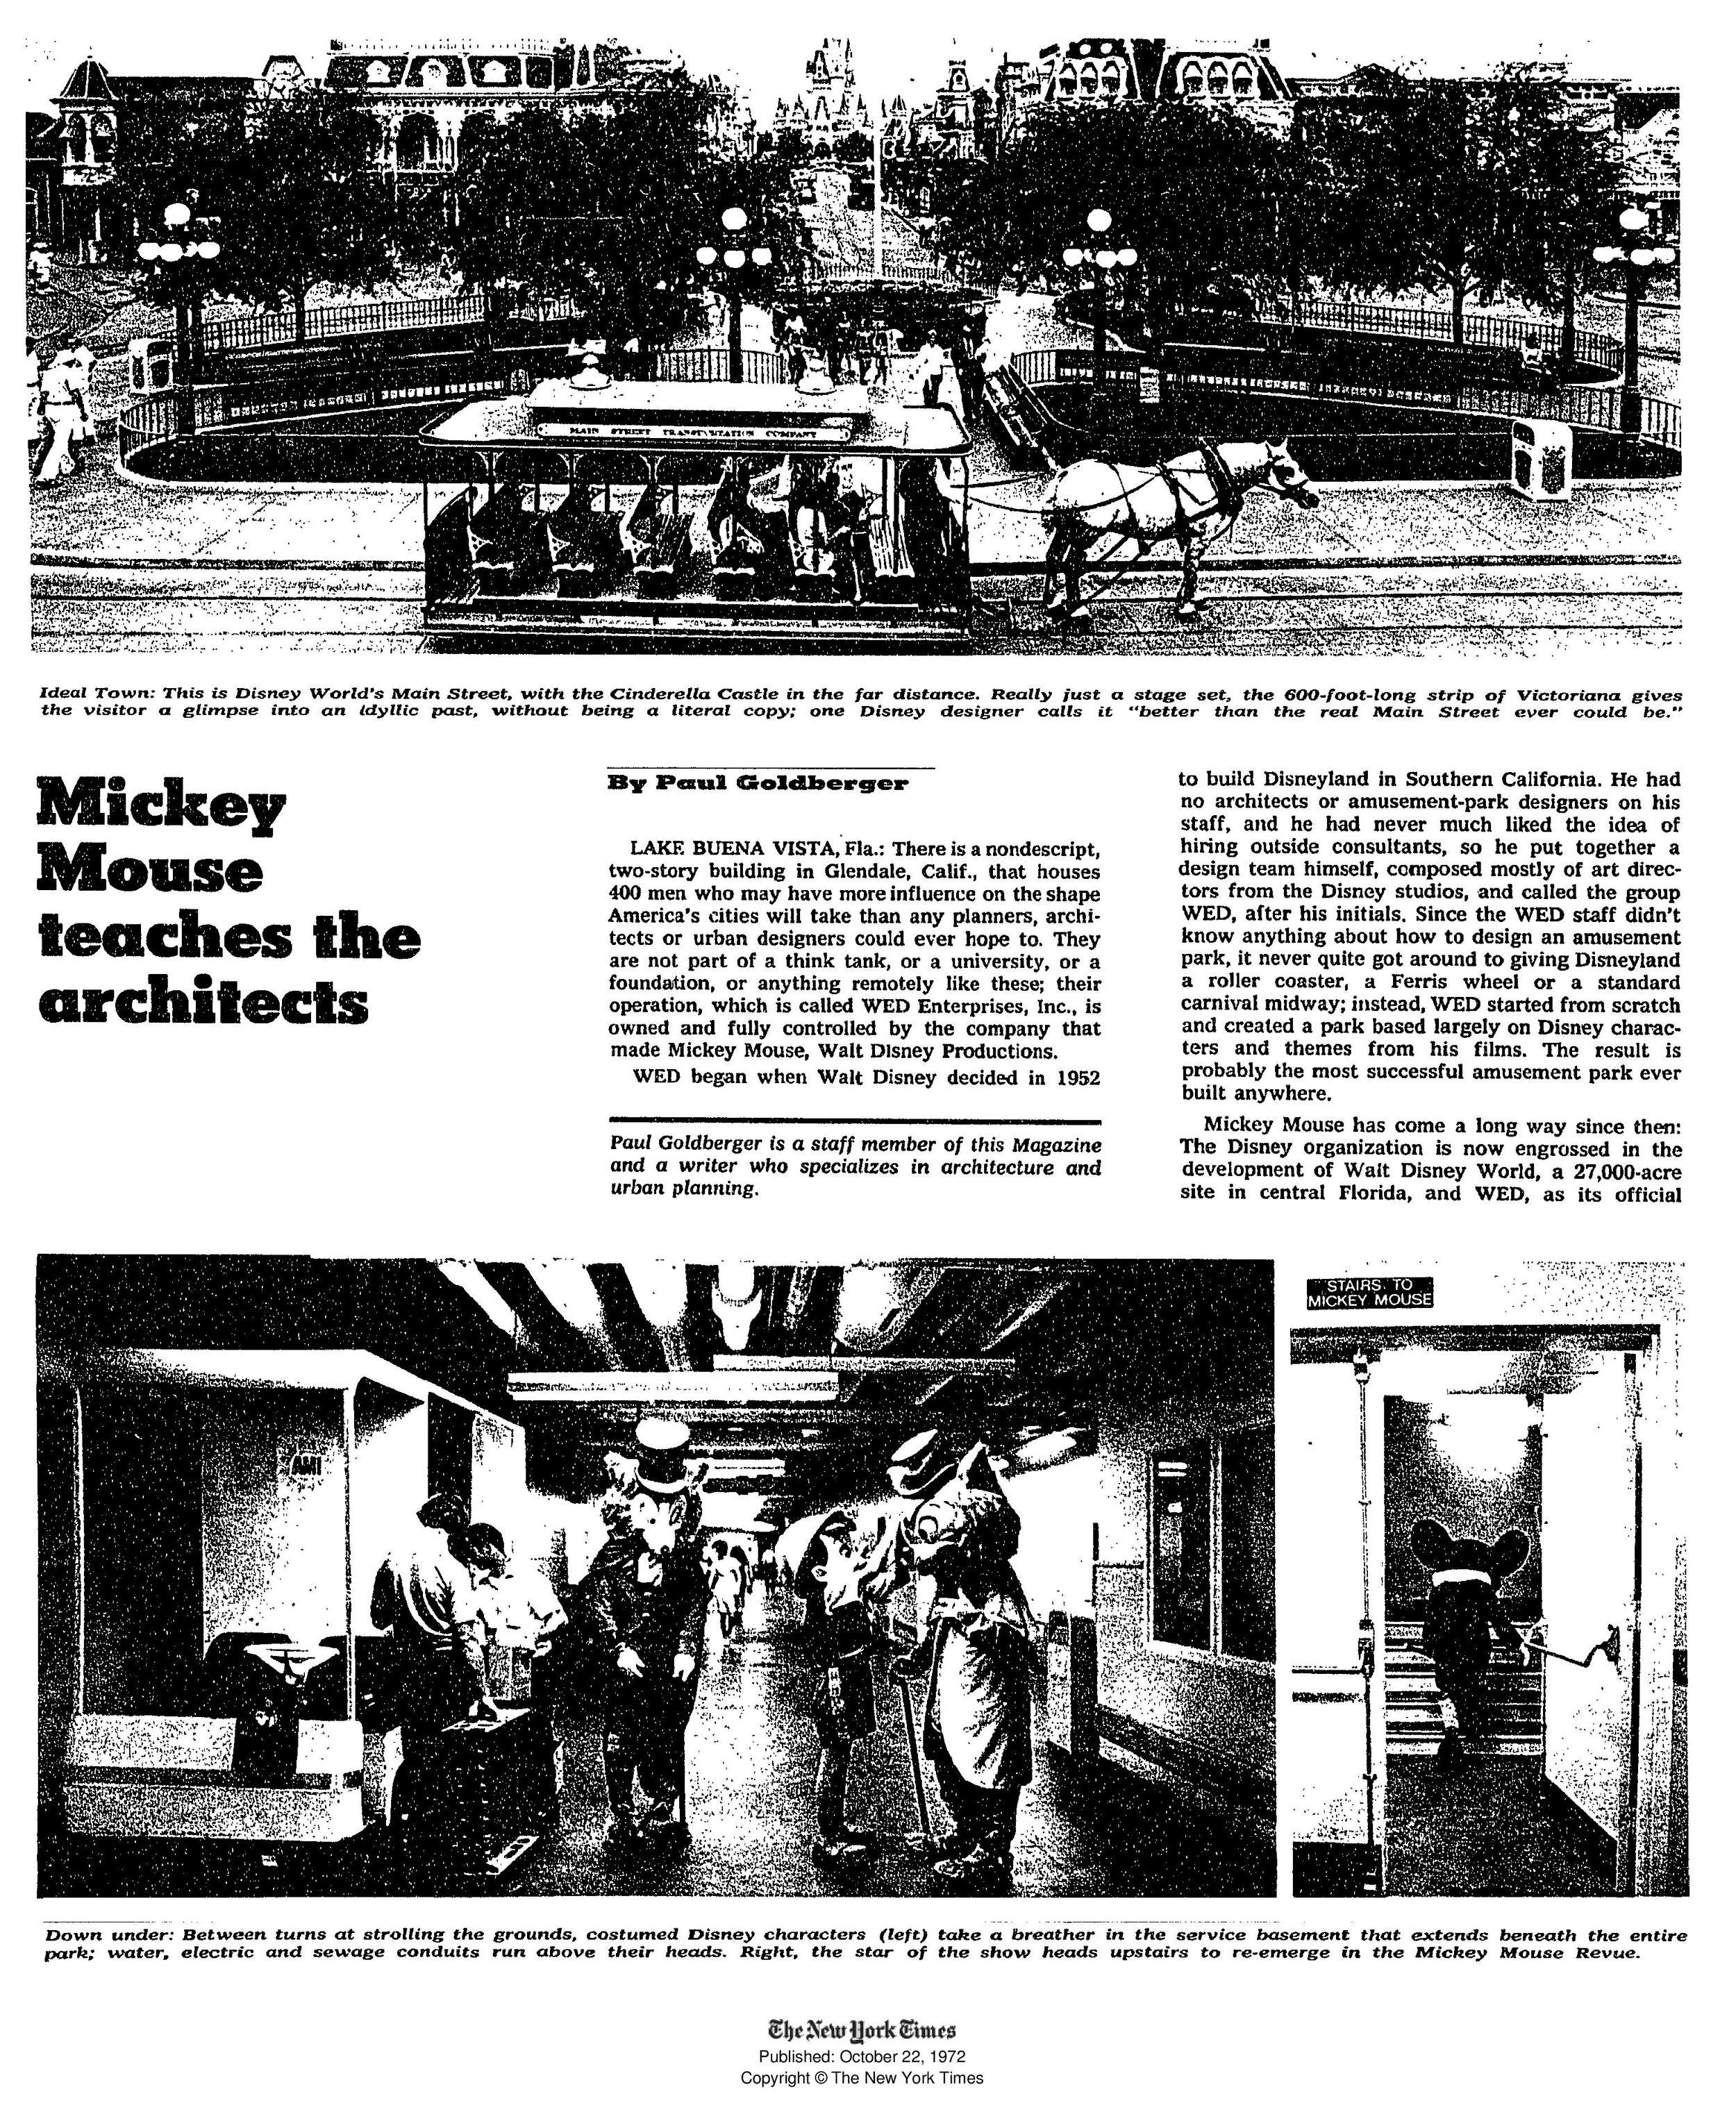 wdw1972-page-001.jpg